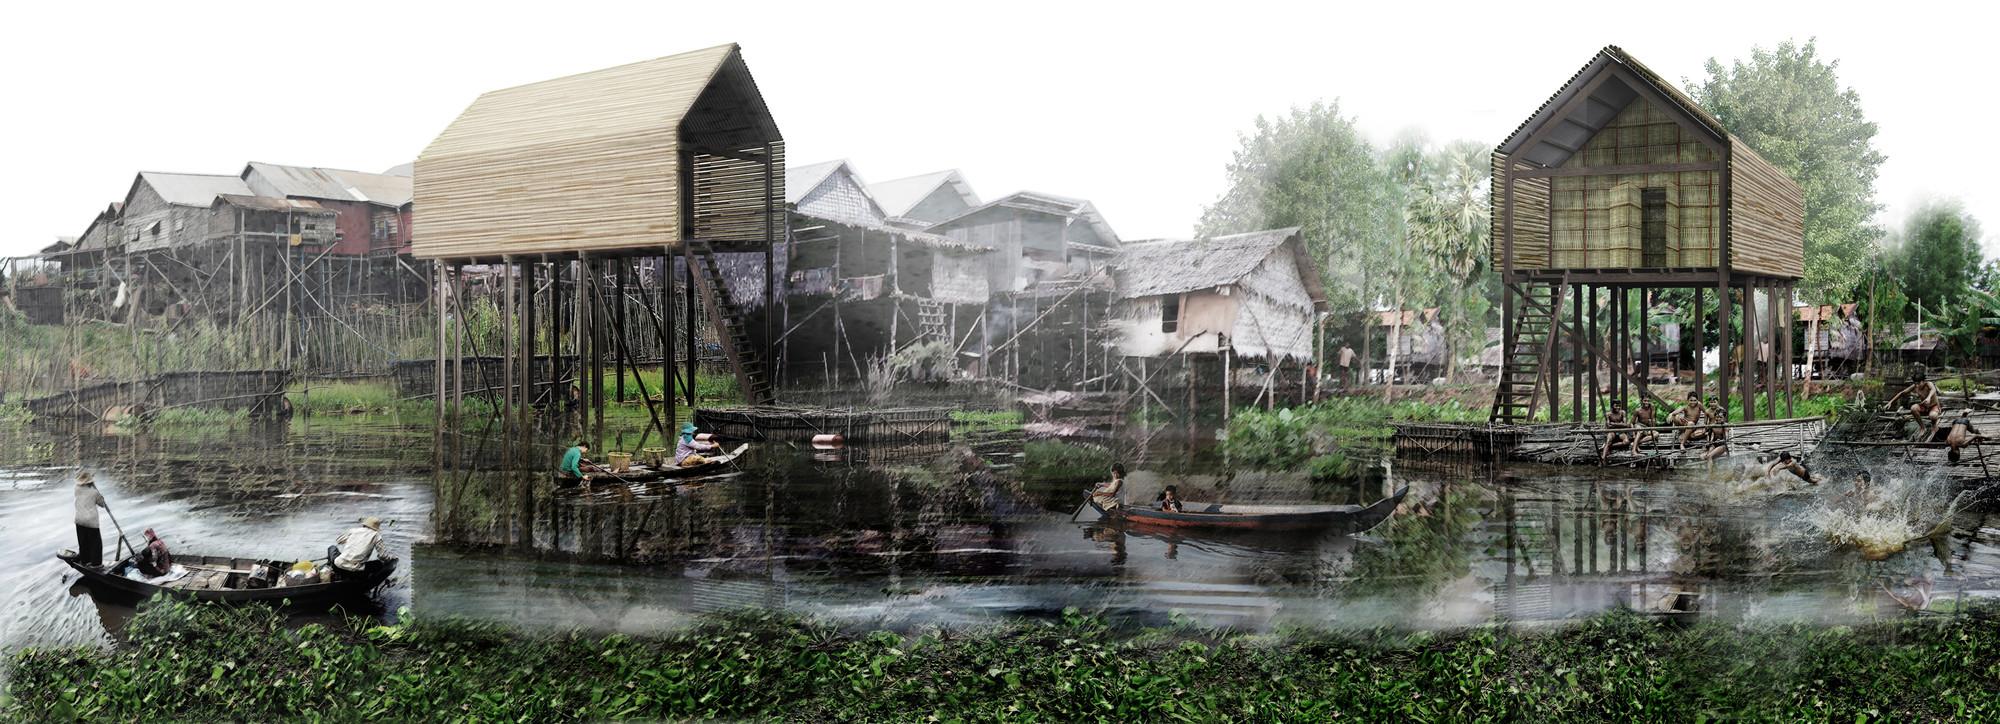 Propuesta de Vivienda Sustentable en Camboya / Architetto Matteo Ascani, Cortesía de Architetto Matteo Ascani